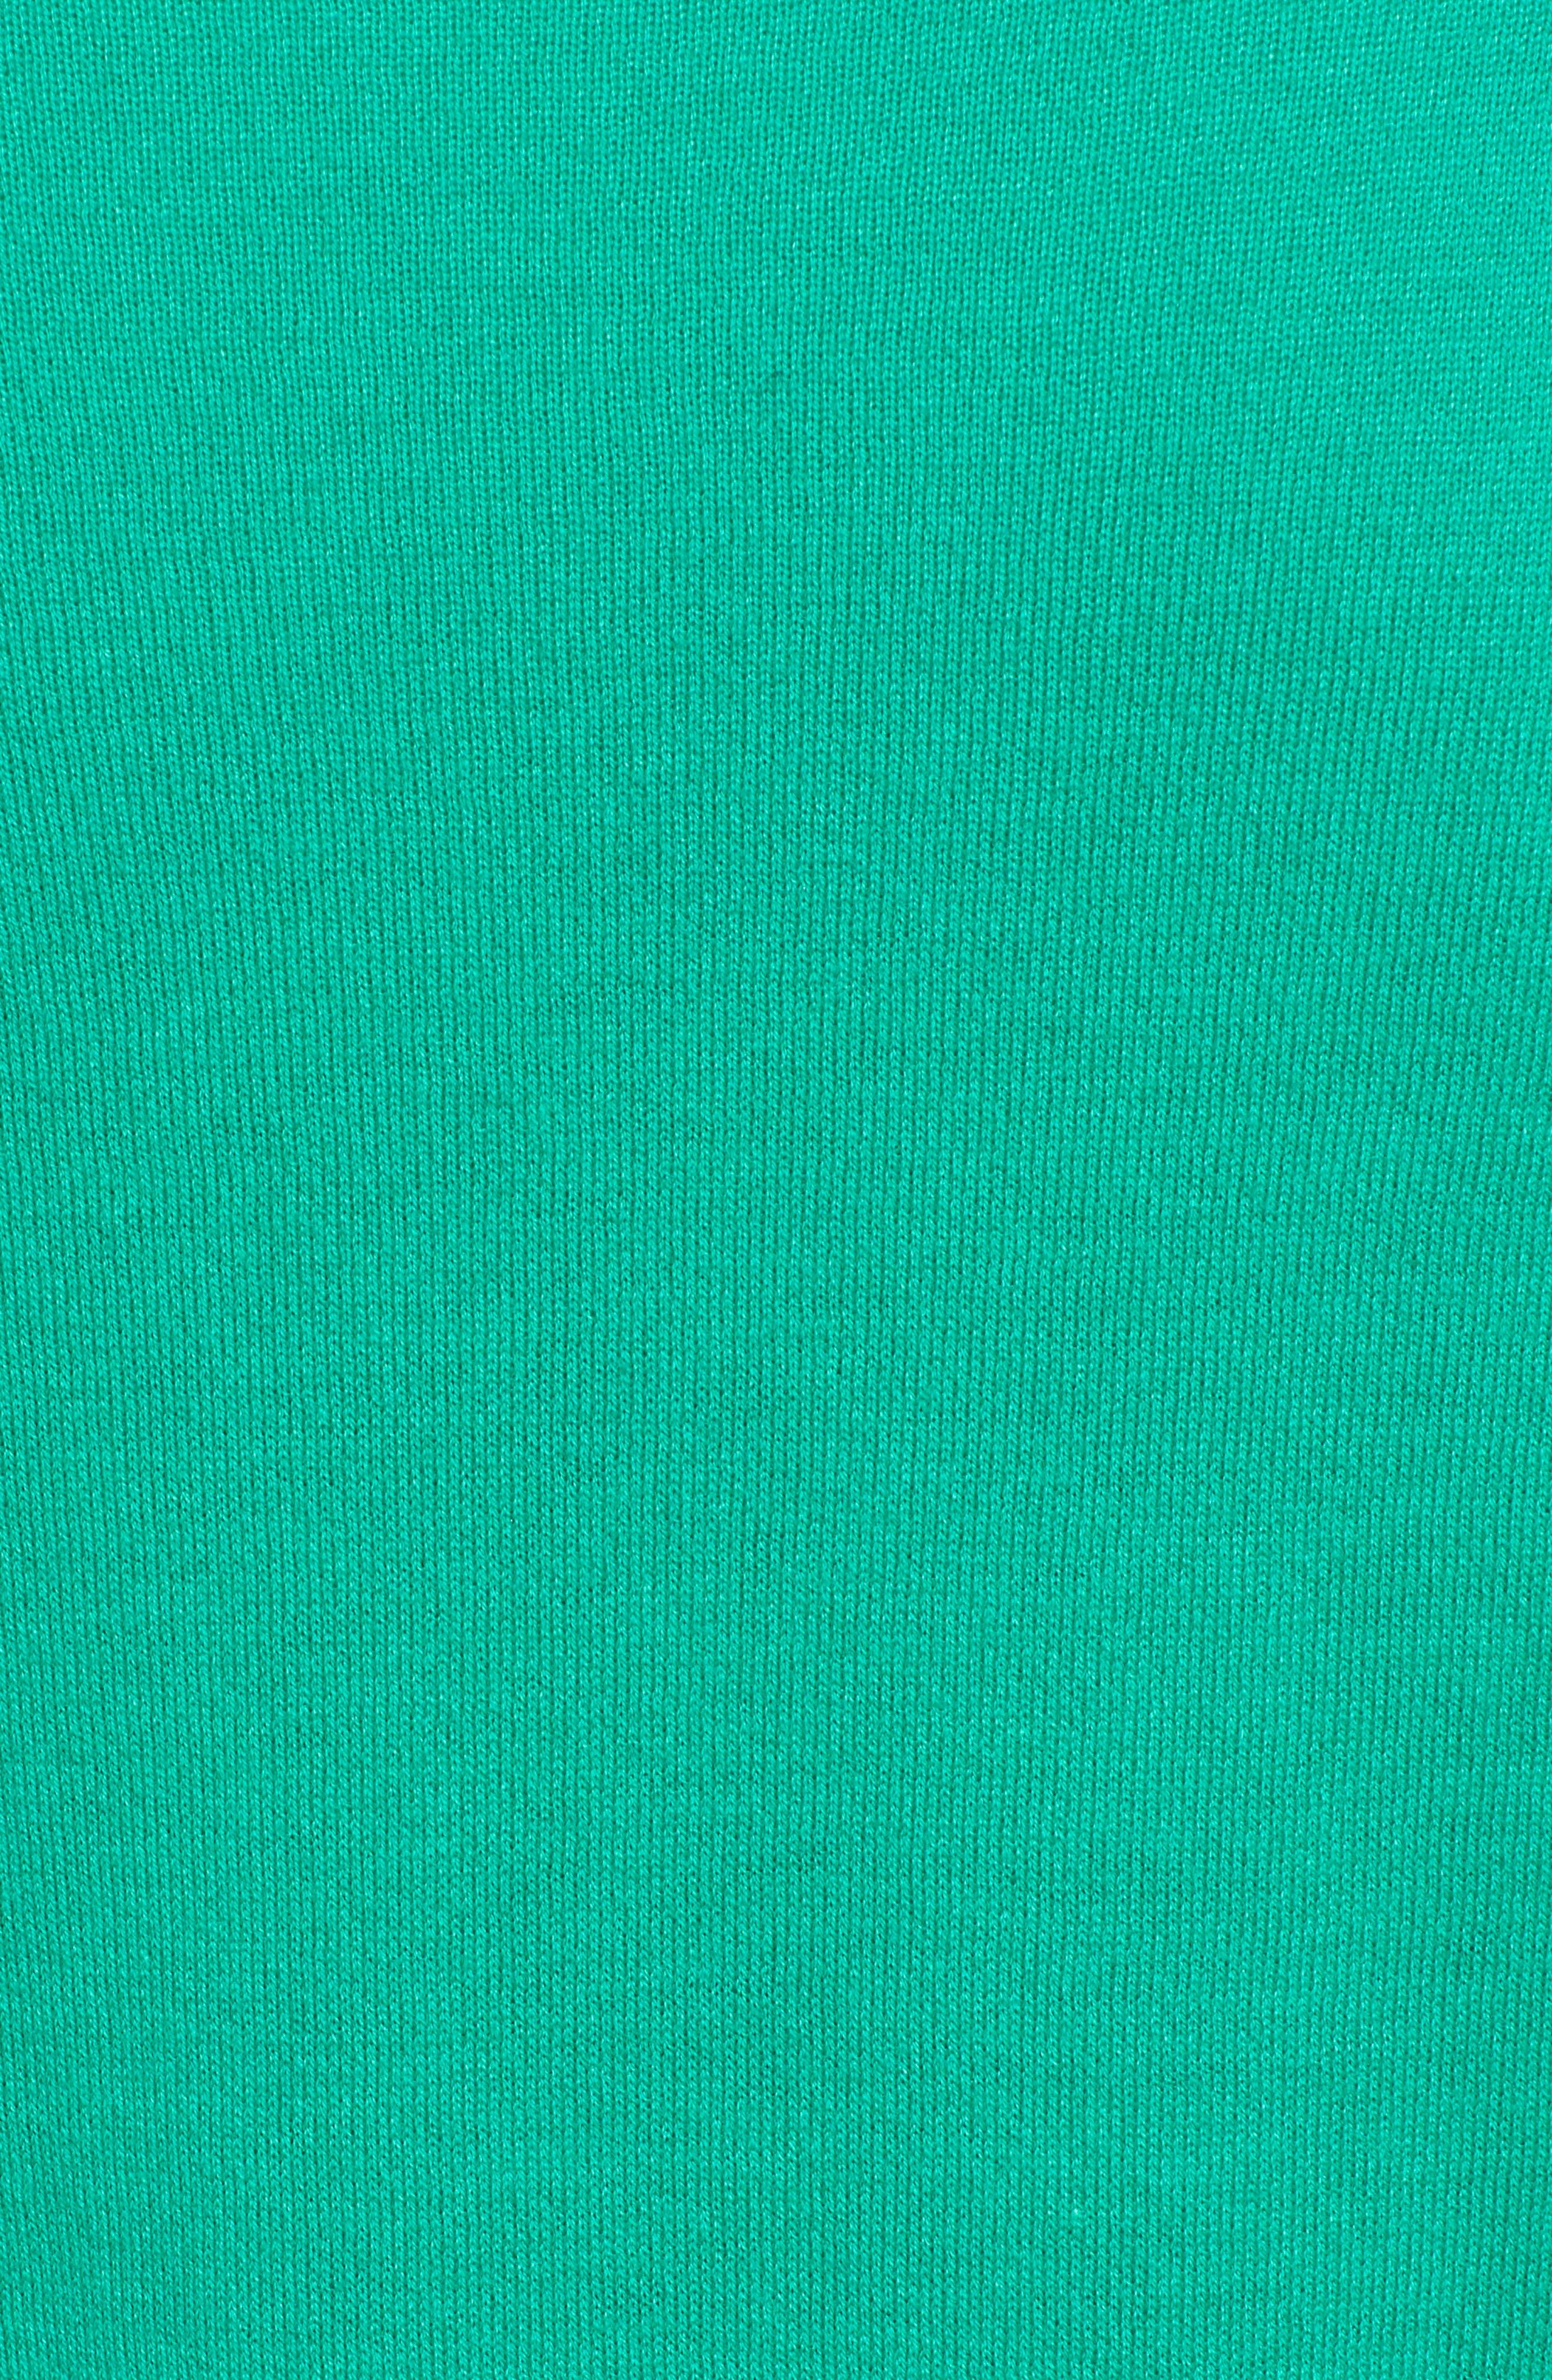 ,                             Scallop Neck Sweater,                             Alternate thumbnail 17, color,                             310